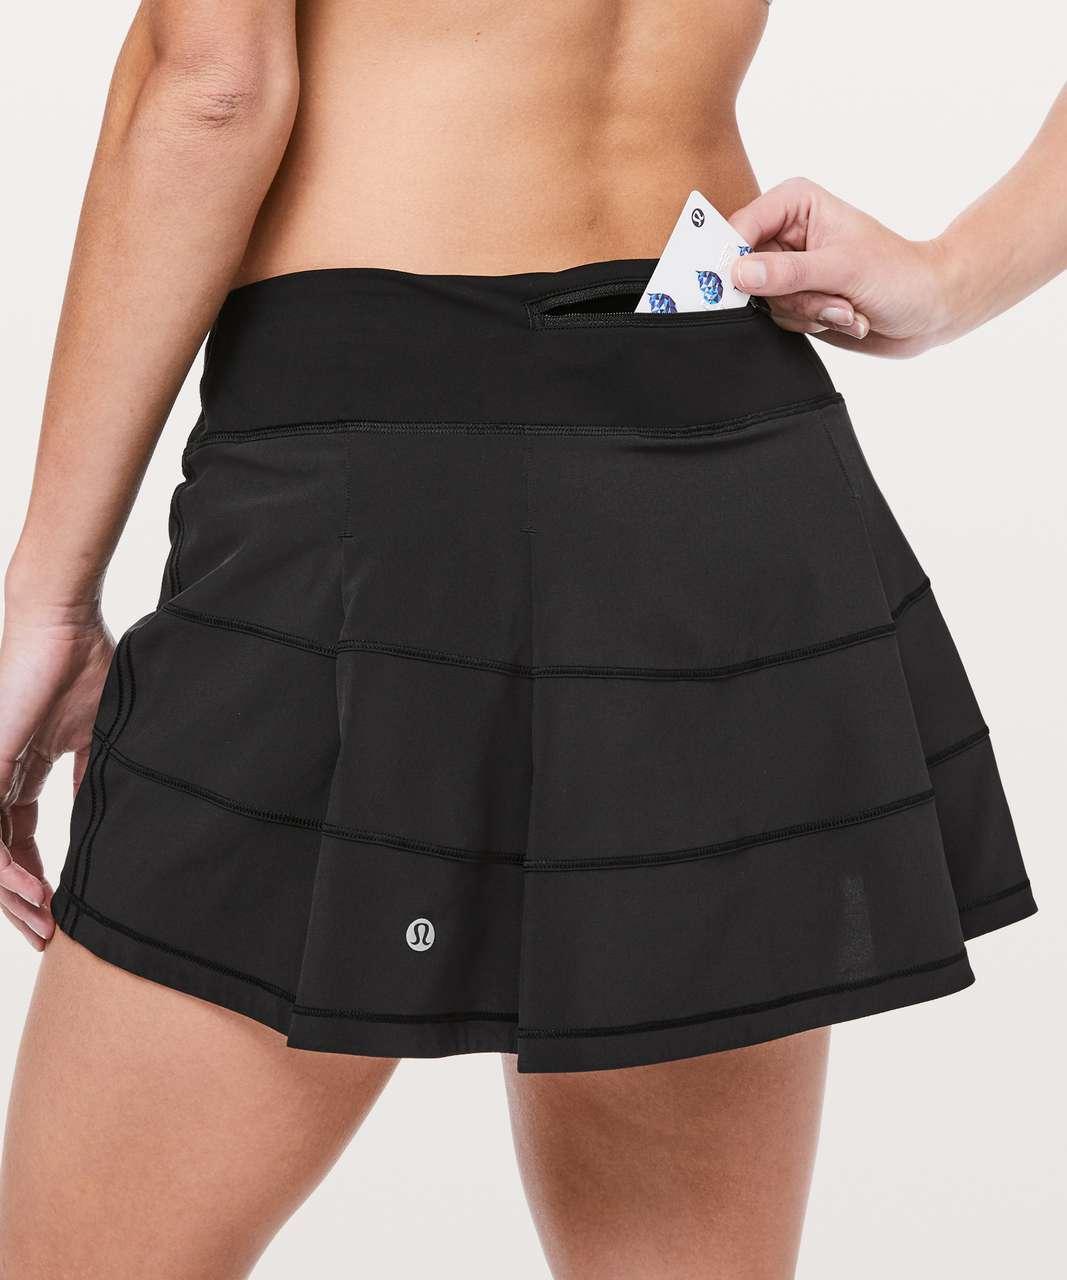 "Lululemon Pace Rival Skirt (Regular) *4-way Stretch 13"" - Black (Second Release)"